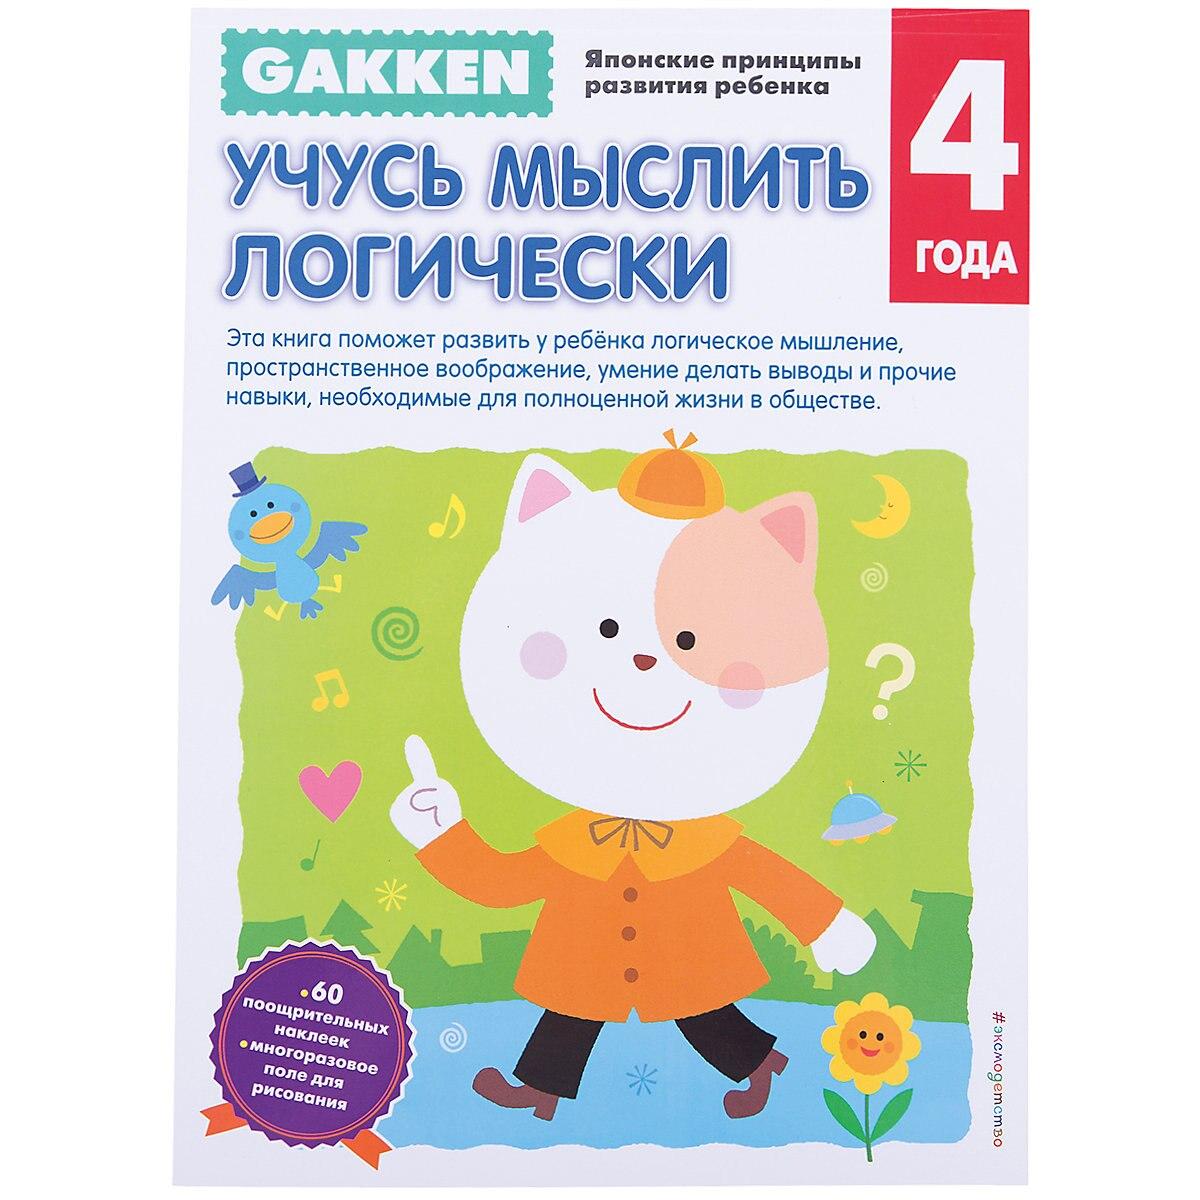 Books EKSMO 5535523 Children Education Encyclopedia Alphabet Dictionary Book For Baby MTpromo